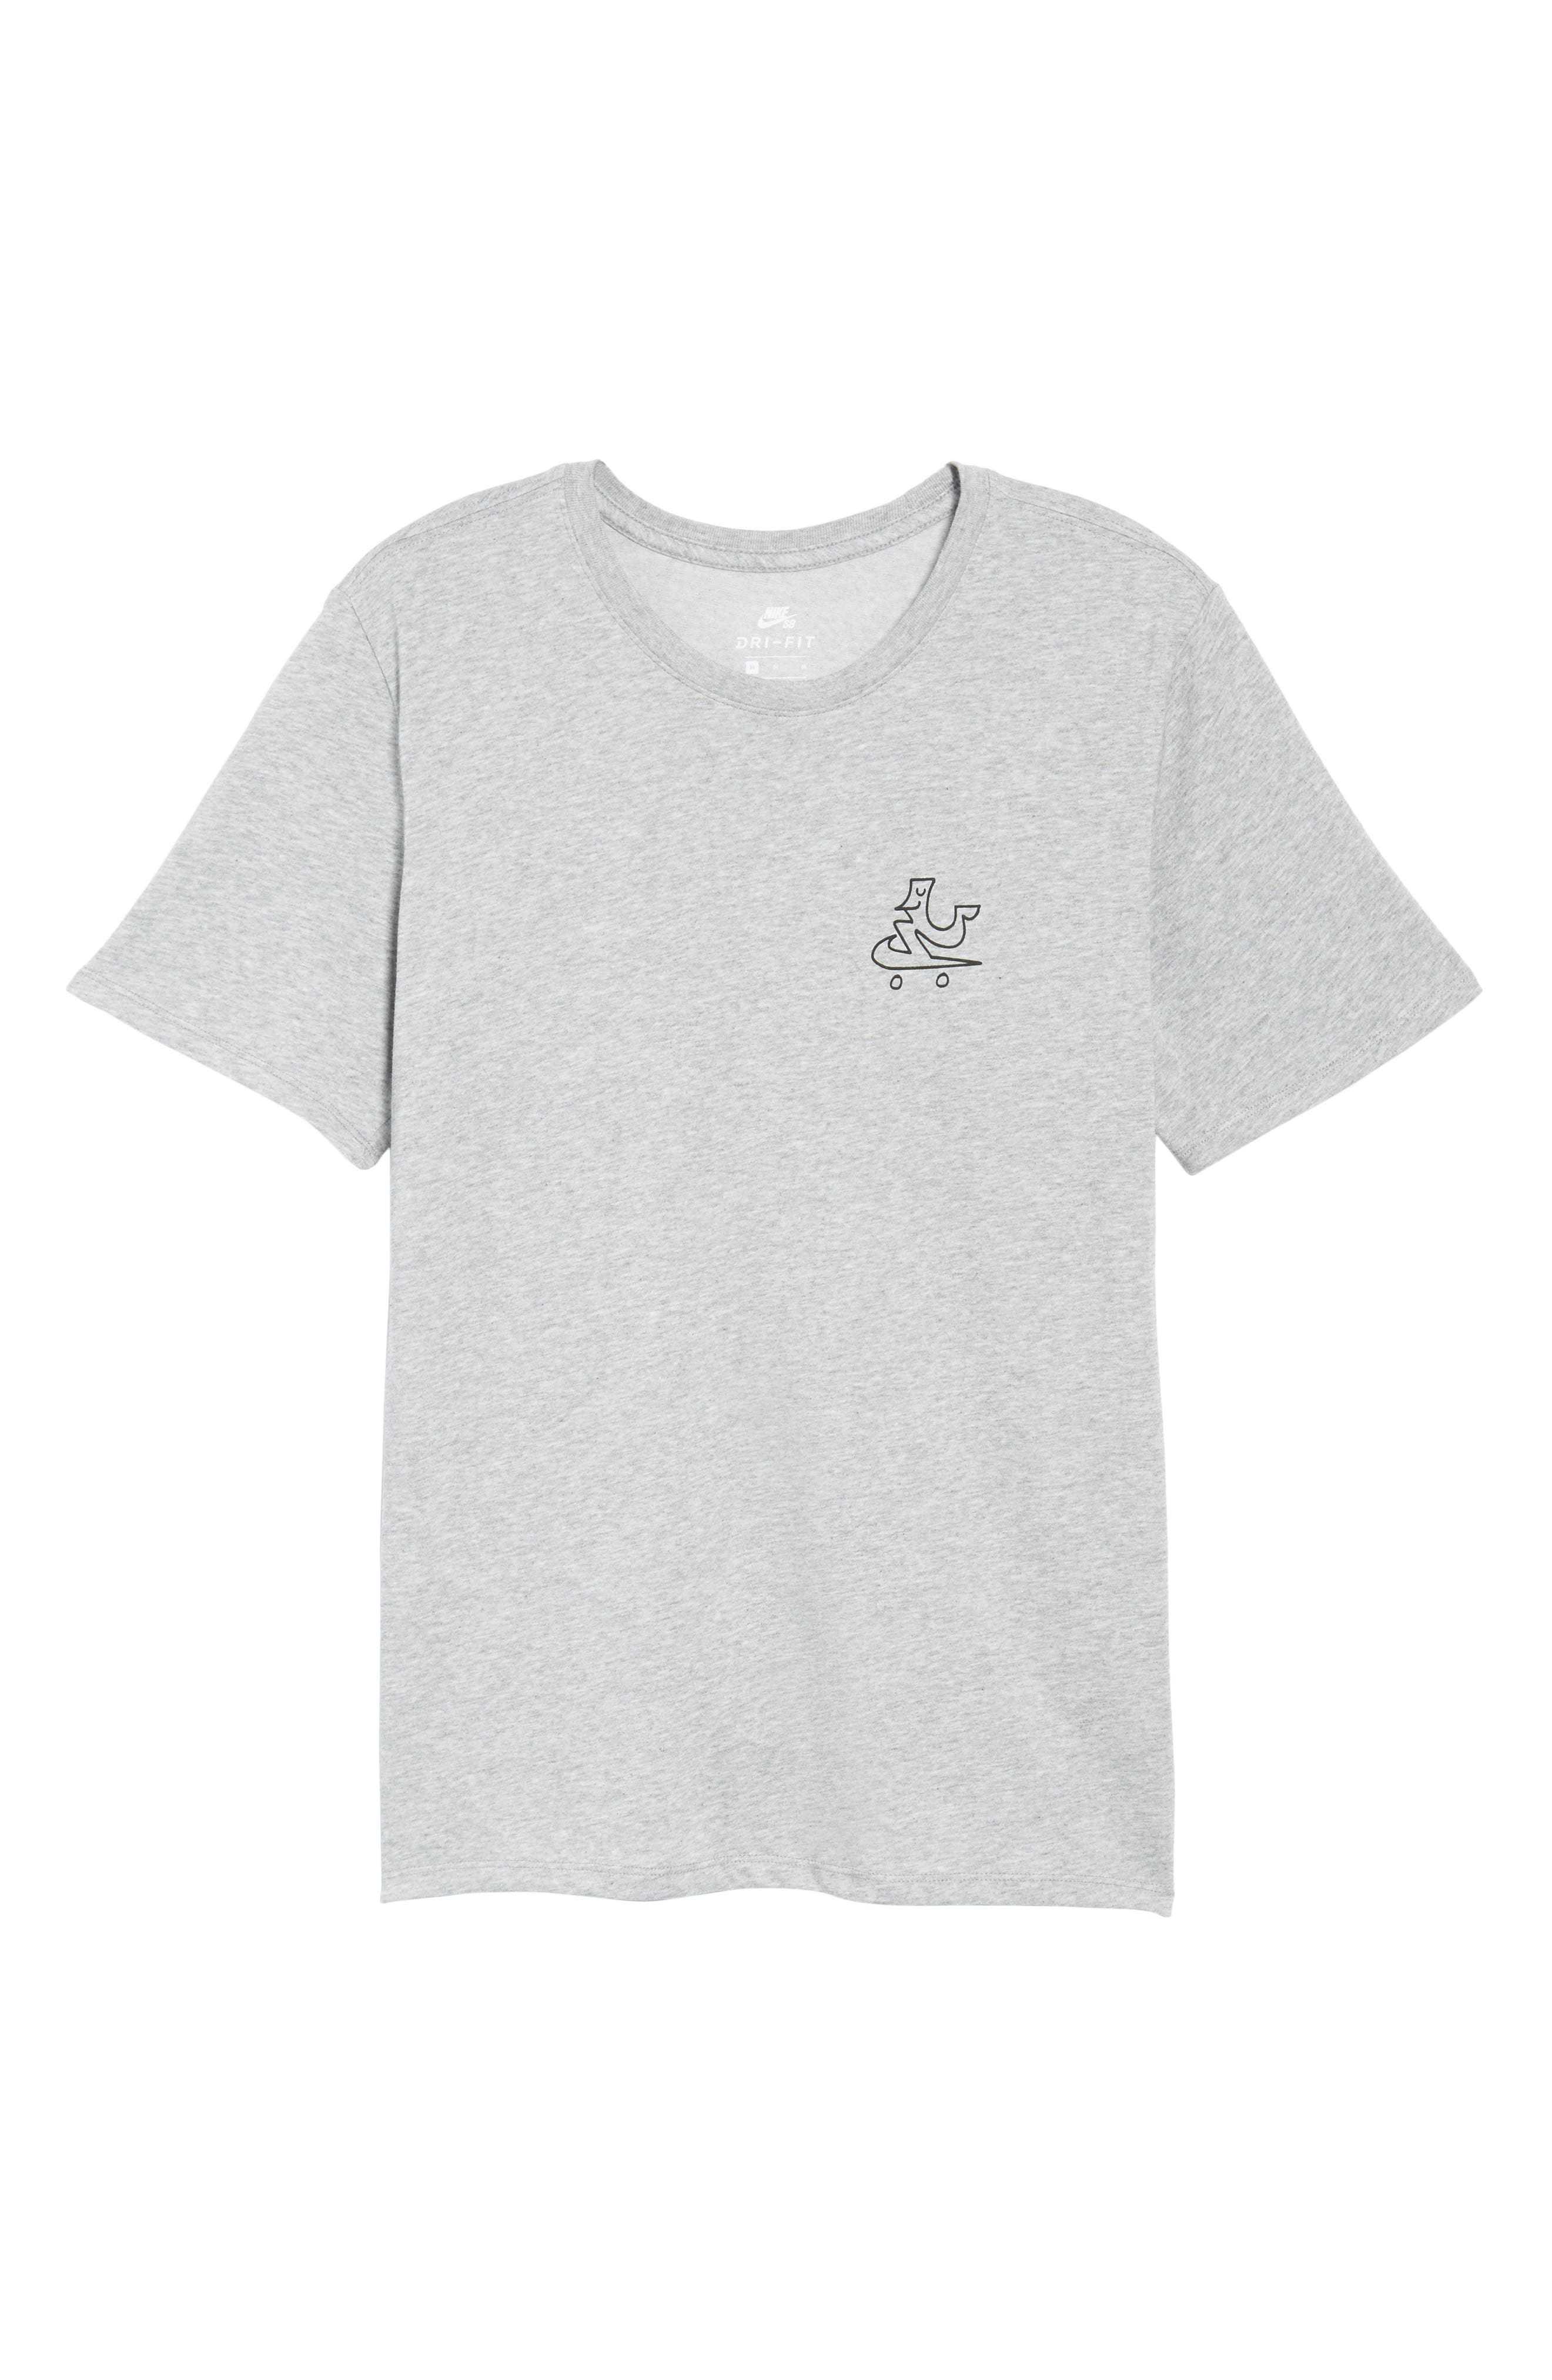 Dry Swooshie Crewneck T-Shirt,                             Alternate thumbnail 6, color,                             Dark Grey Heather/ Black